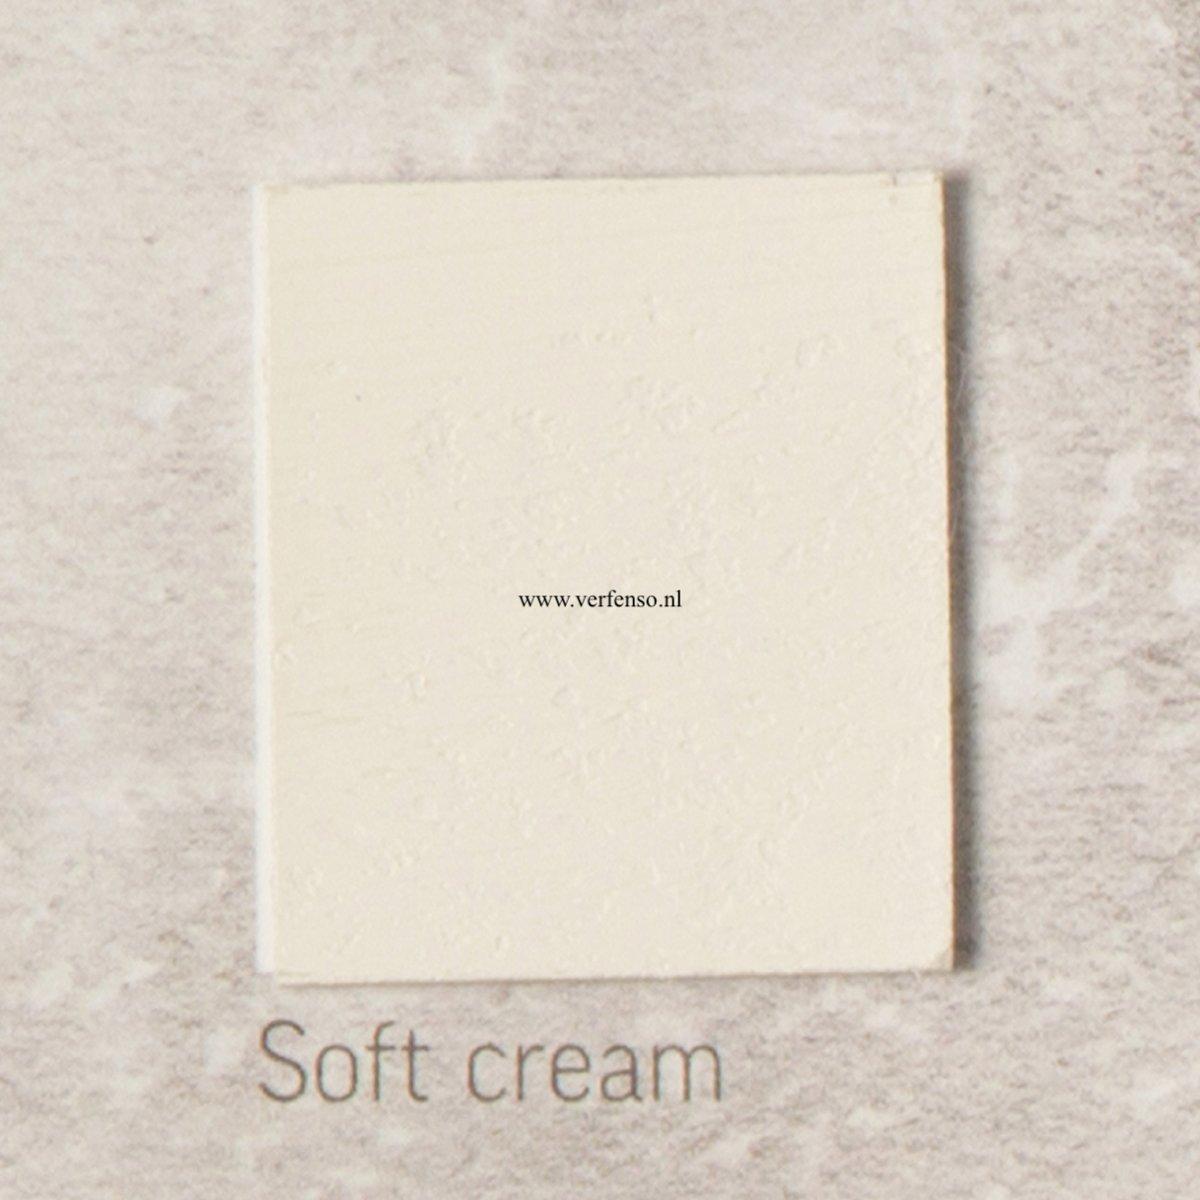 Jeanne d' Arc Living Vintage Paint Matt Furniture Paint Soft Cream 700ml/krijtverf